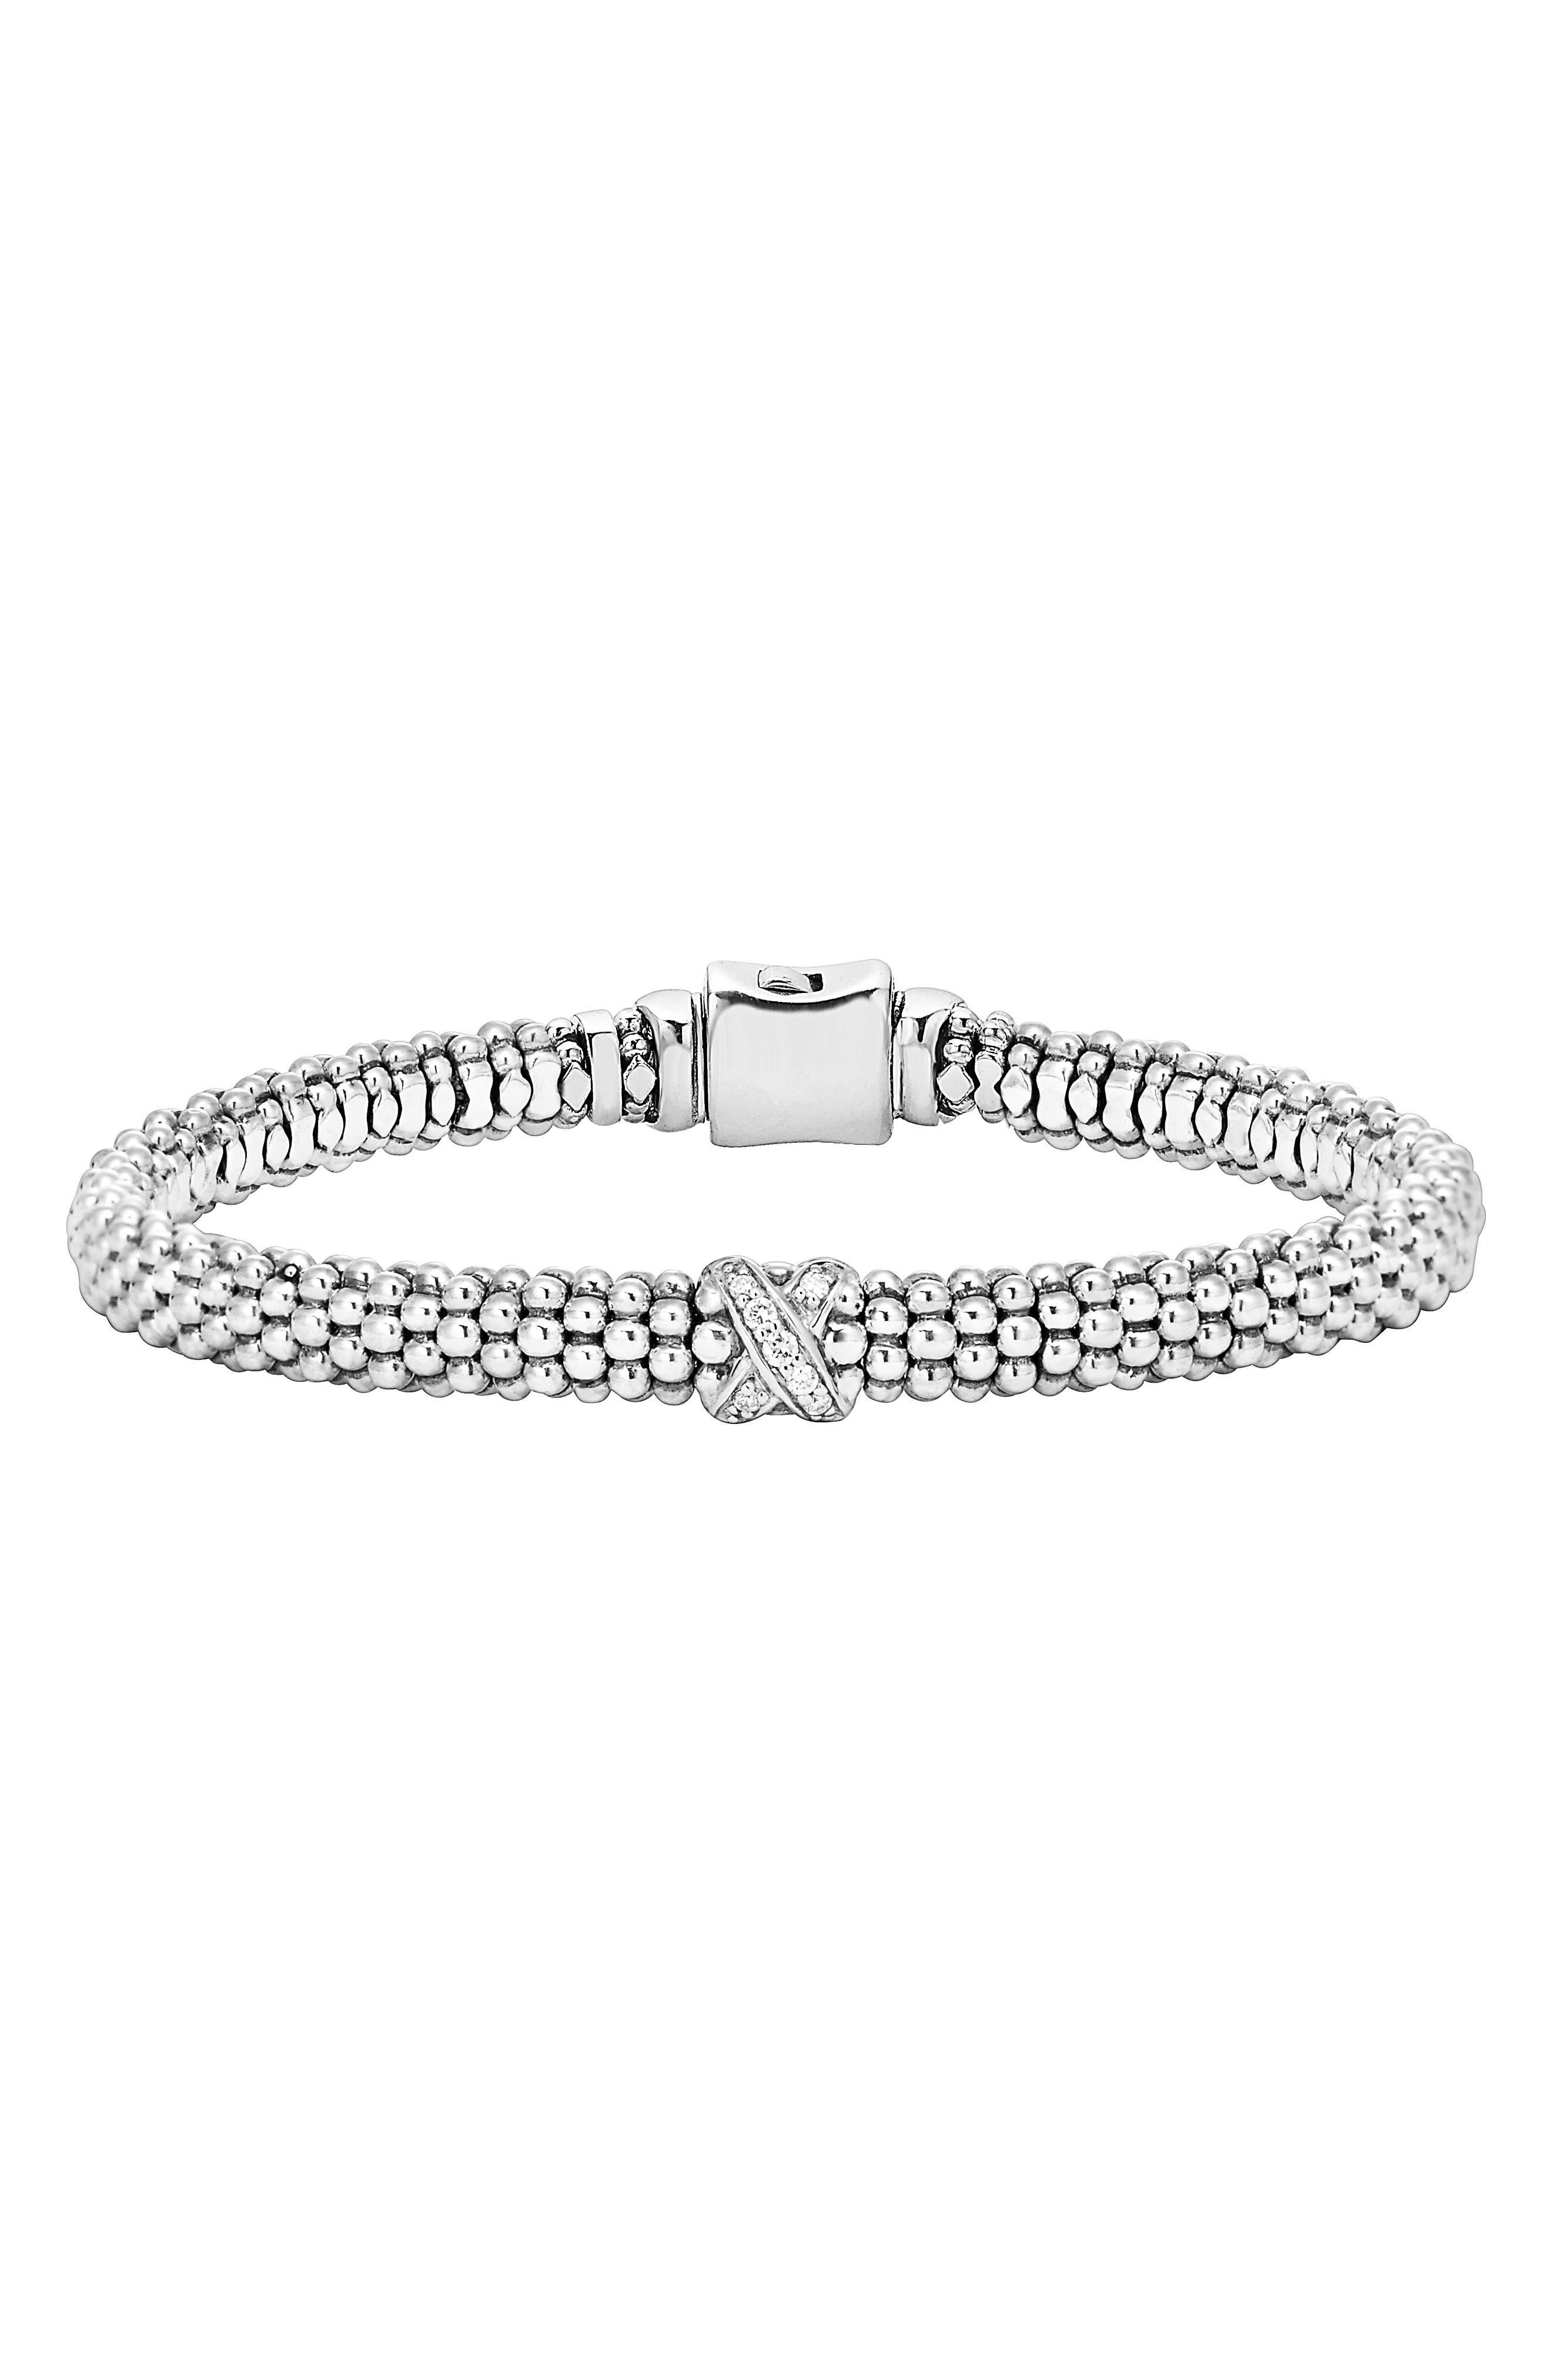 Caviar 'Signature Caviar' Diamond Rope Bracelet,                         Main,                         color, STERLING SILVER